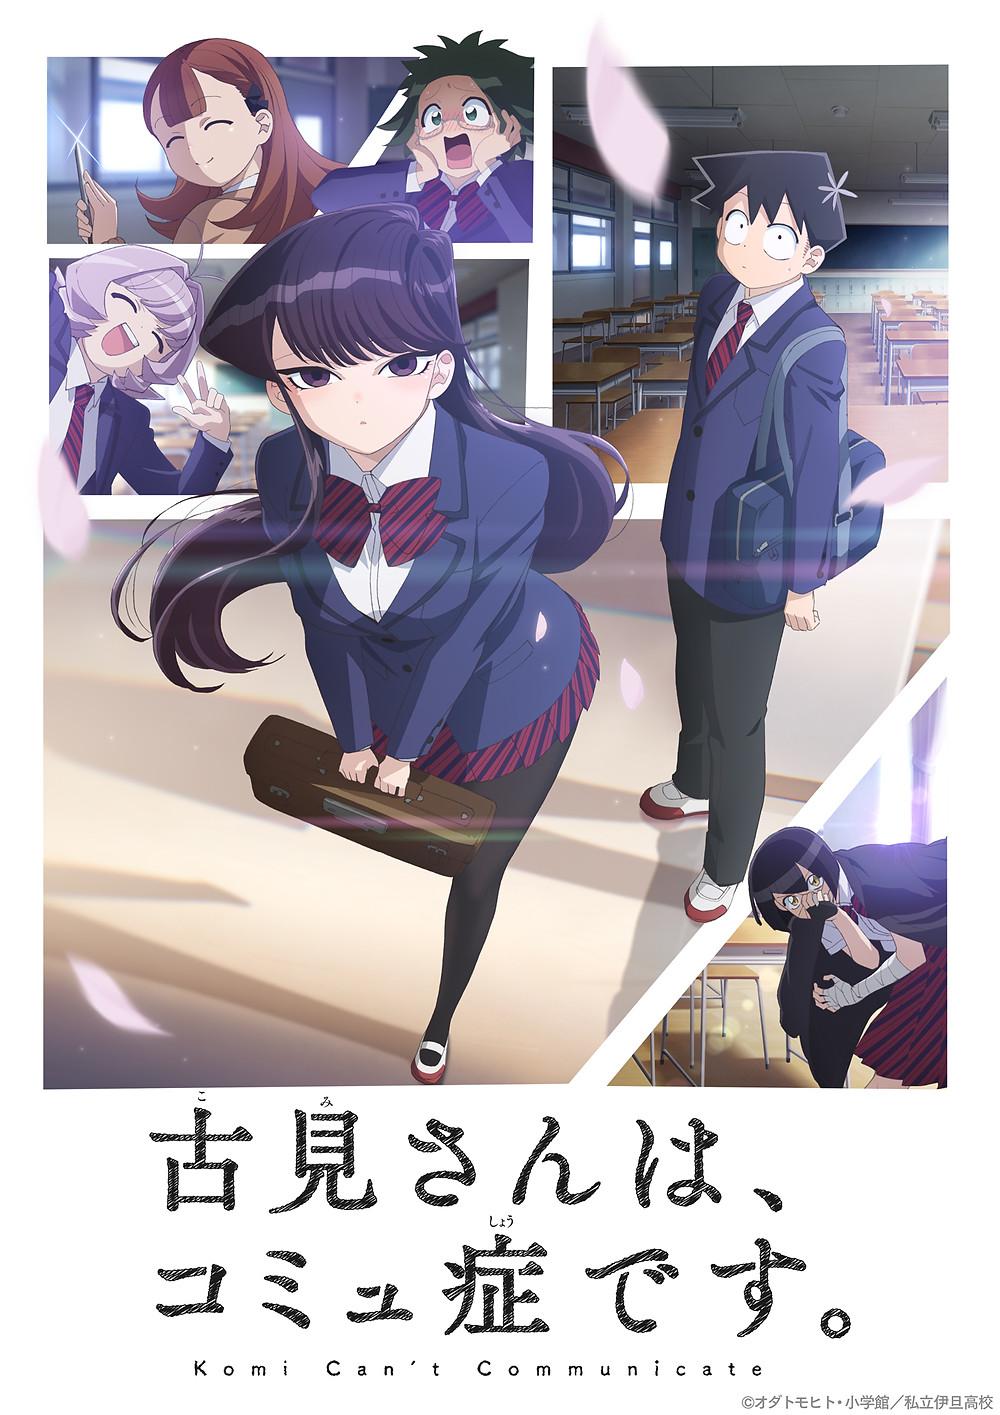 Komi Can't Communicate TV anime new key visual